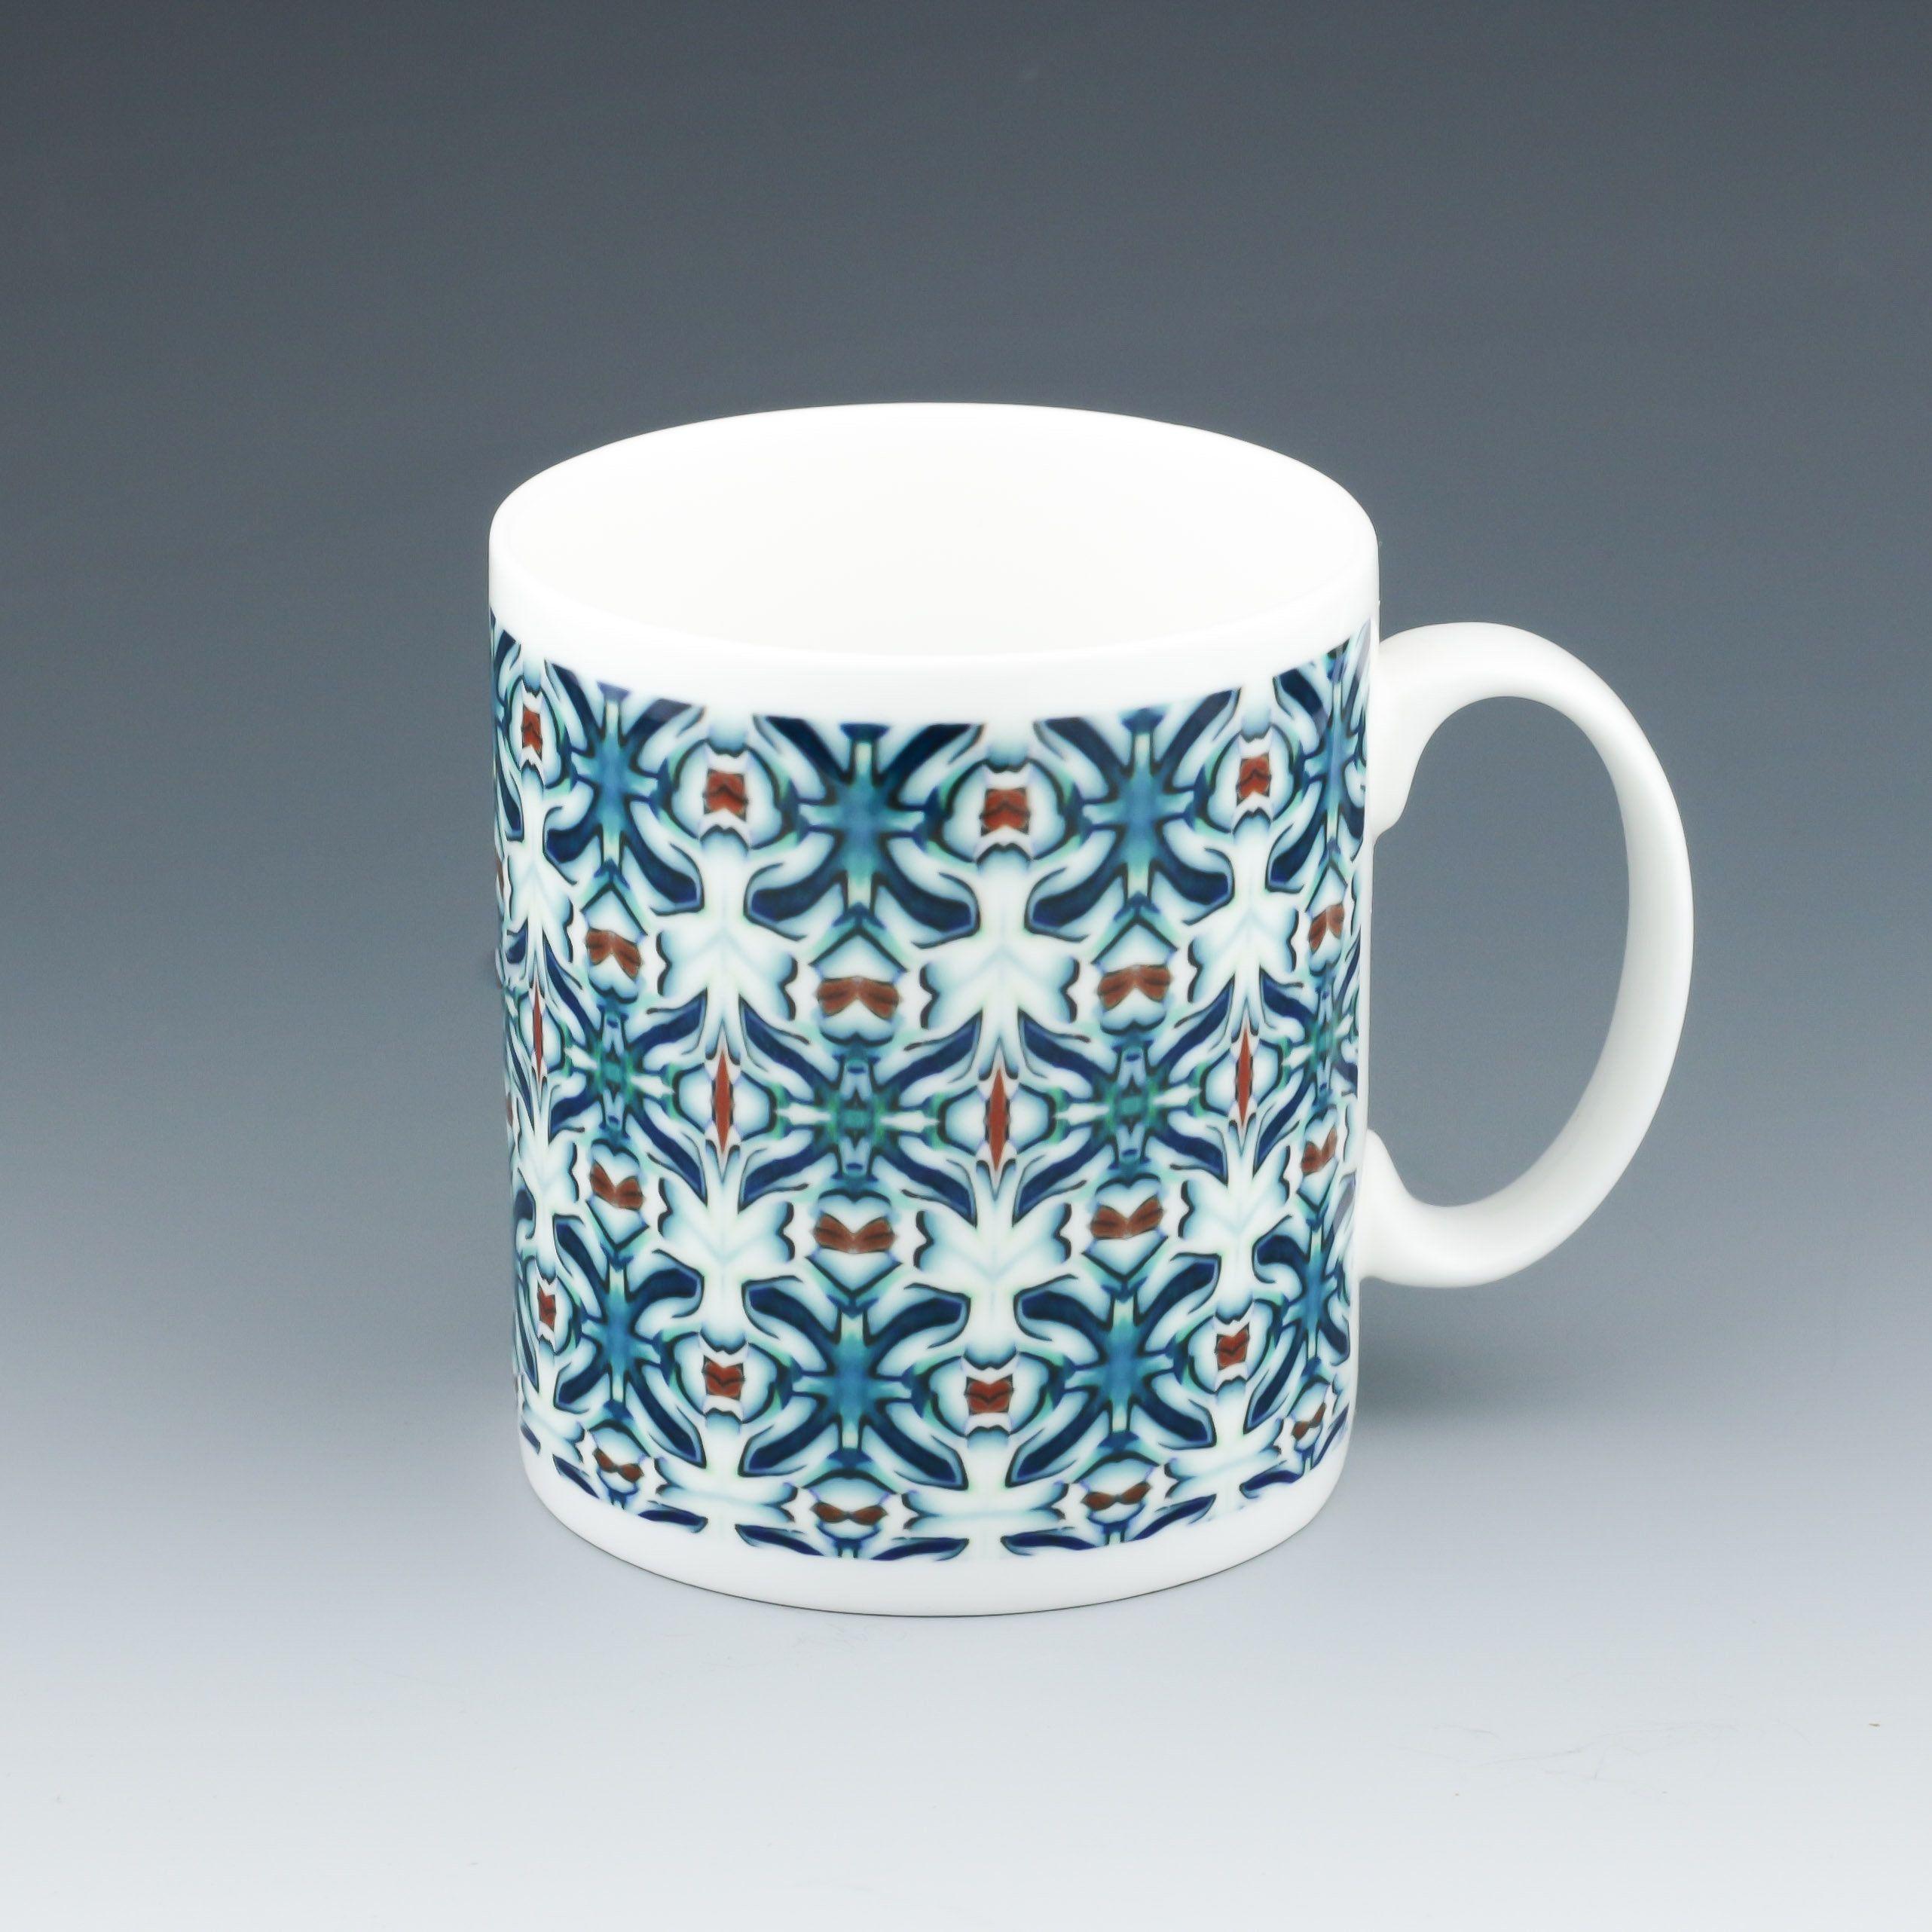 Art Deco Homeware Coffee Mug Retro China Tea Cup